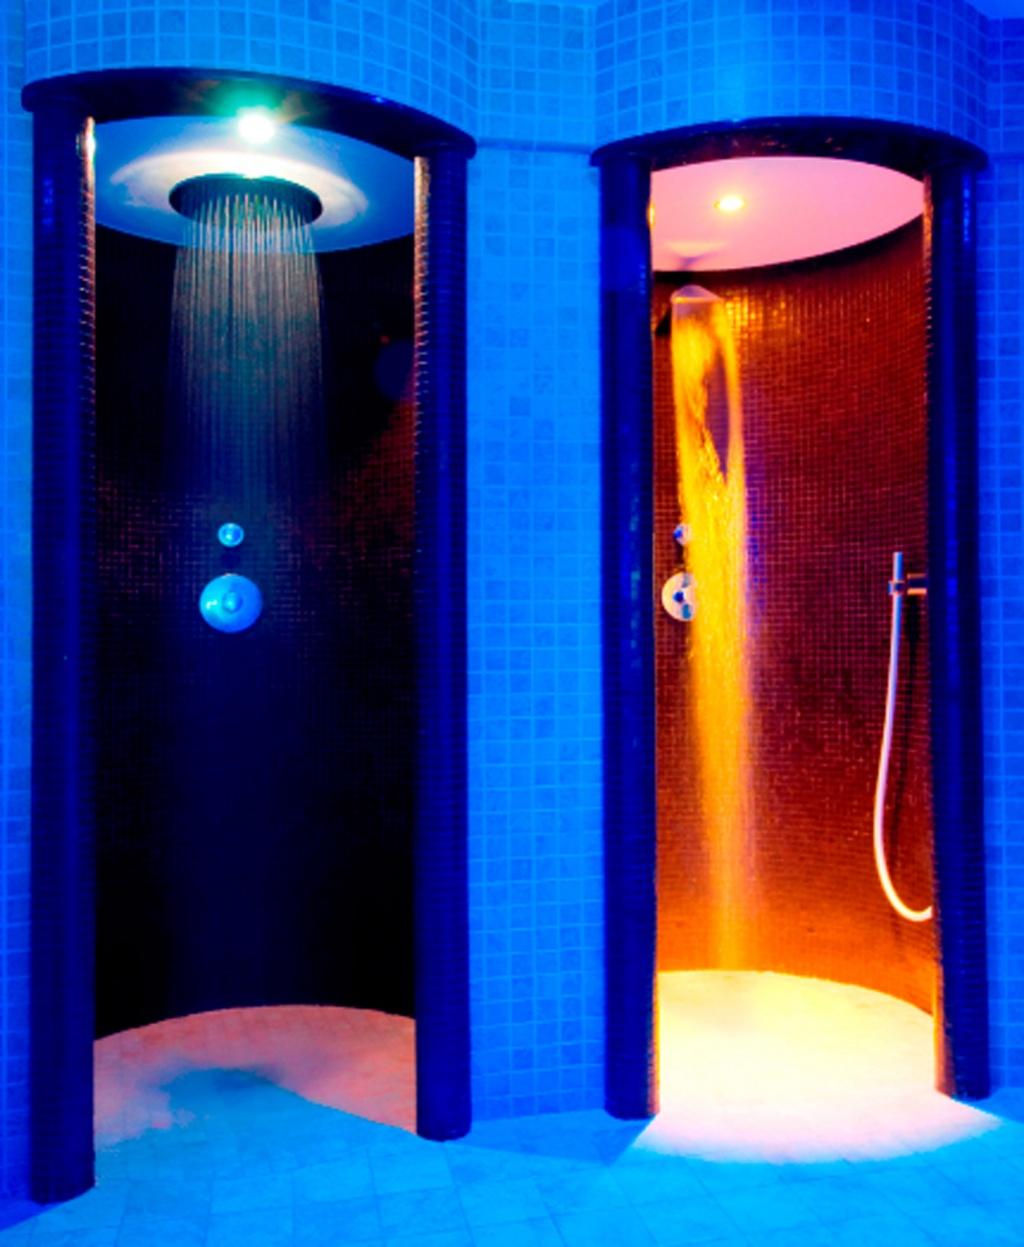 Circuito Wellness : Hipocampo palace mallorca completo circuito wellness